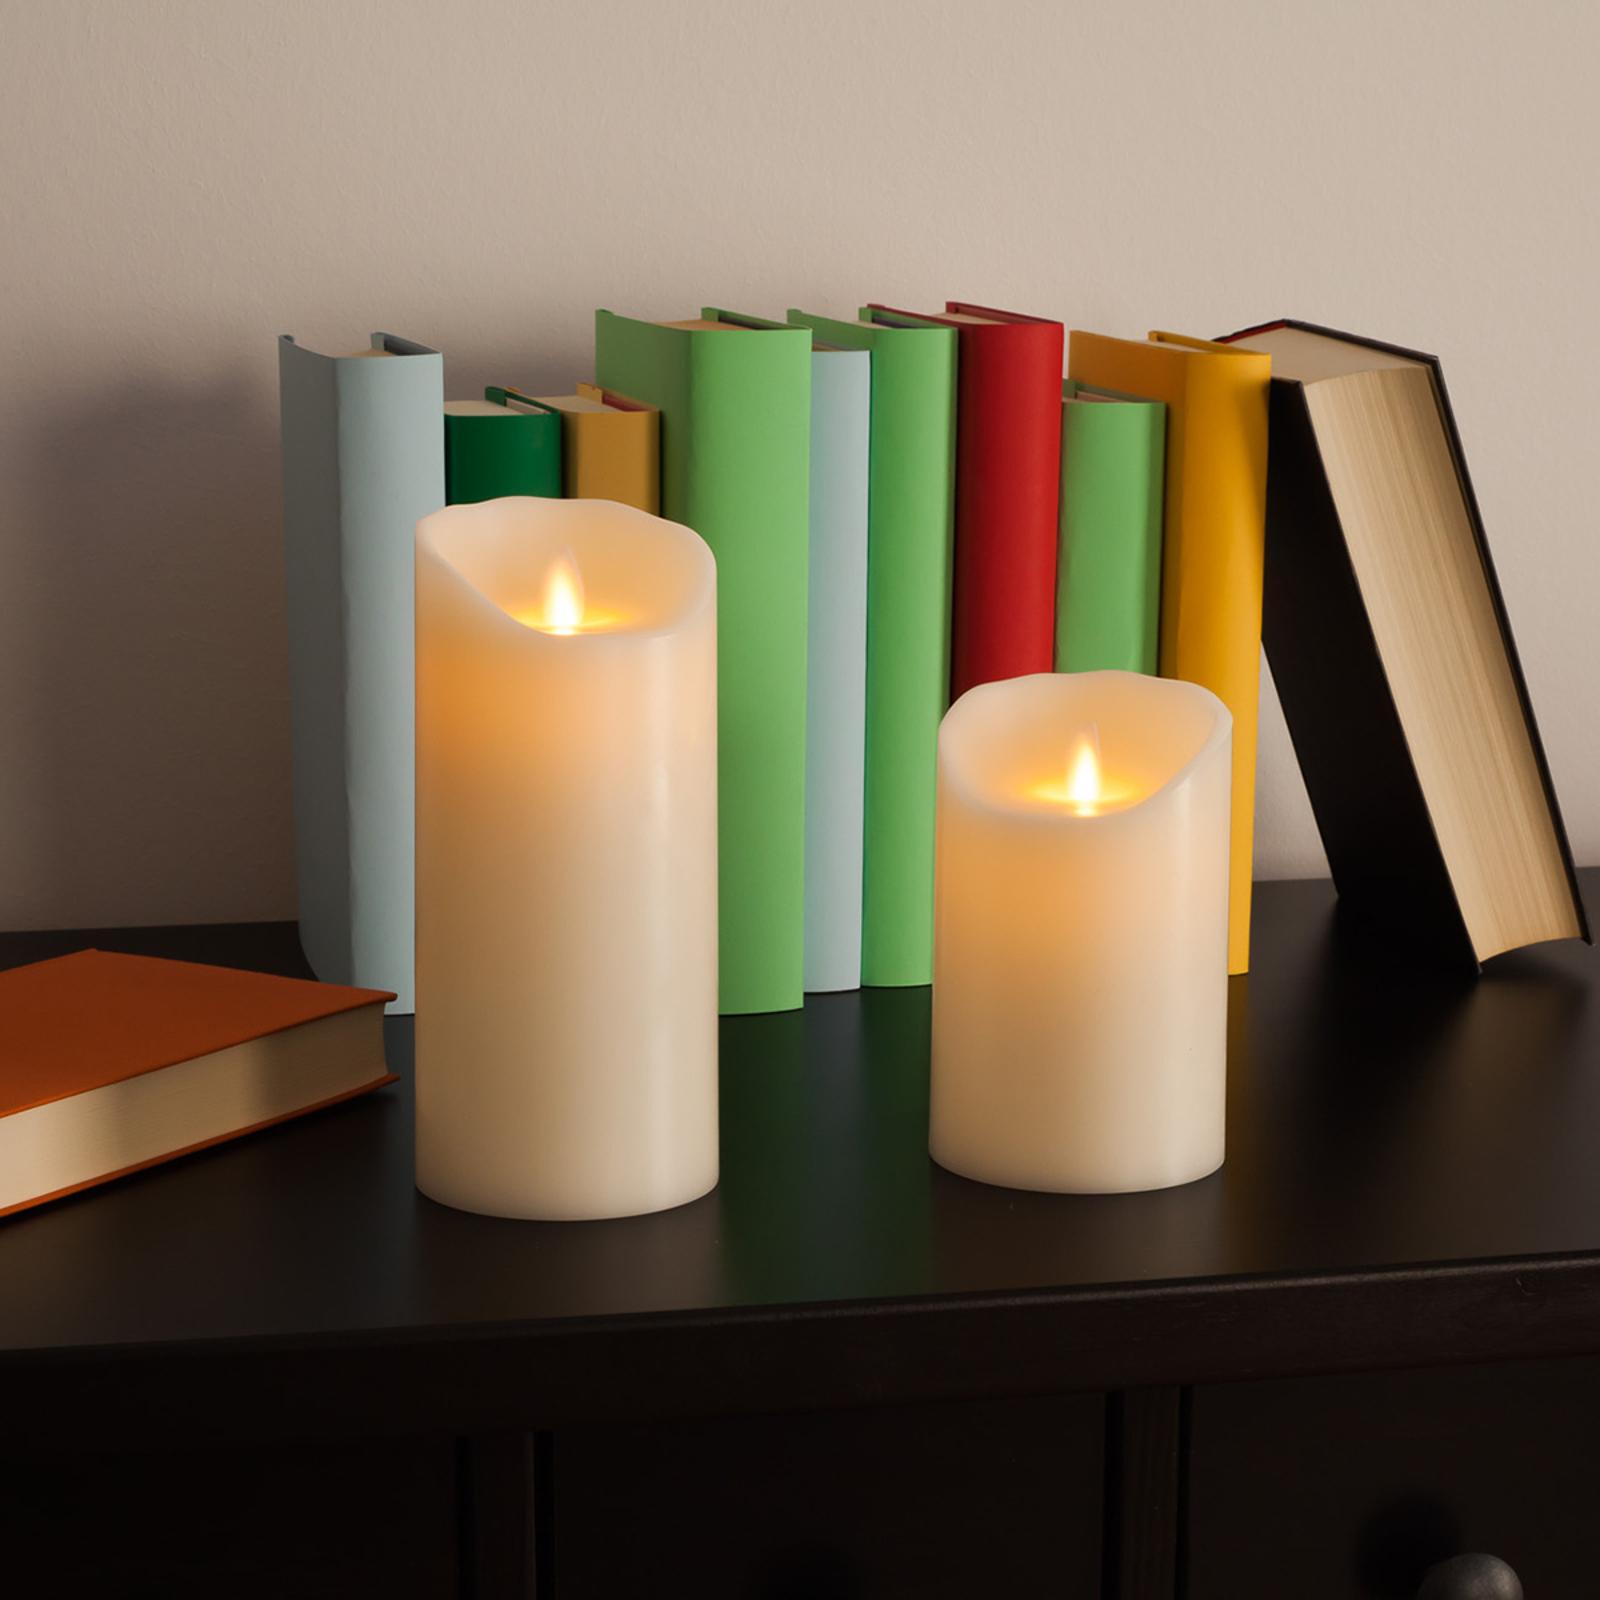 LED-kynttilä Flame aidosta vahasta 12,5 cm